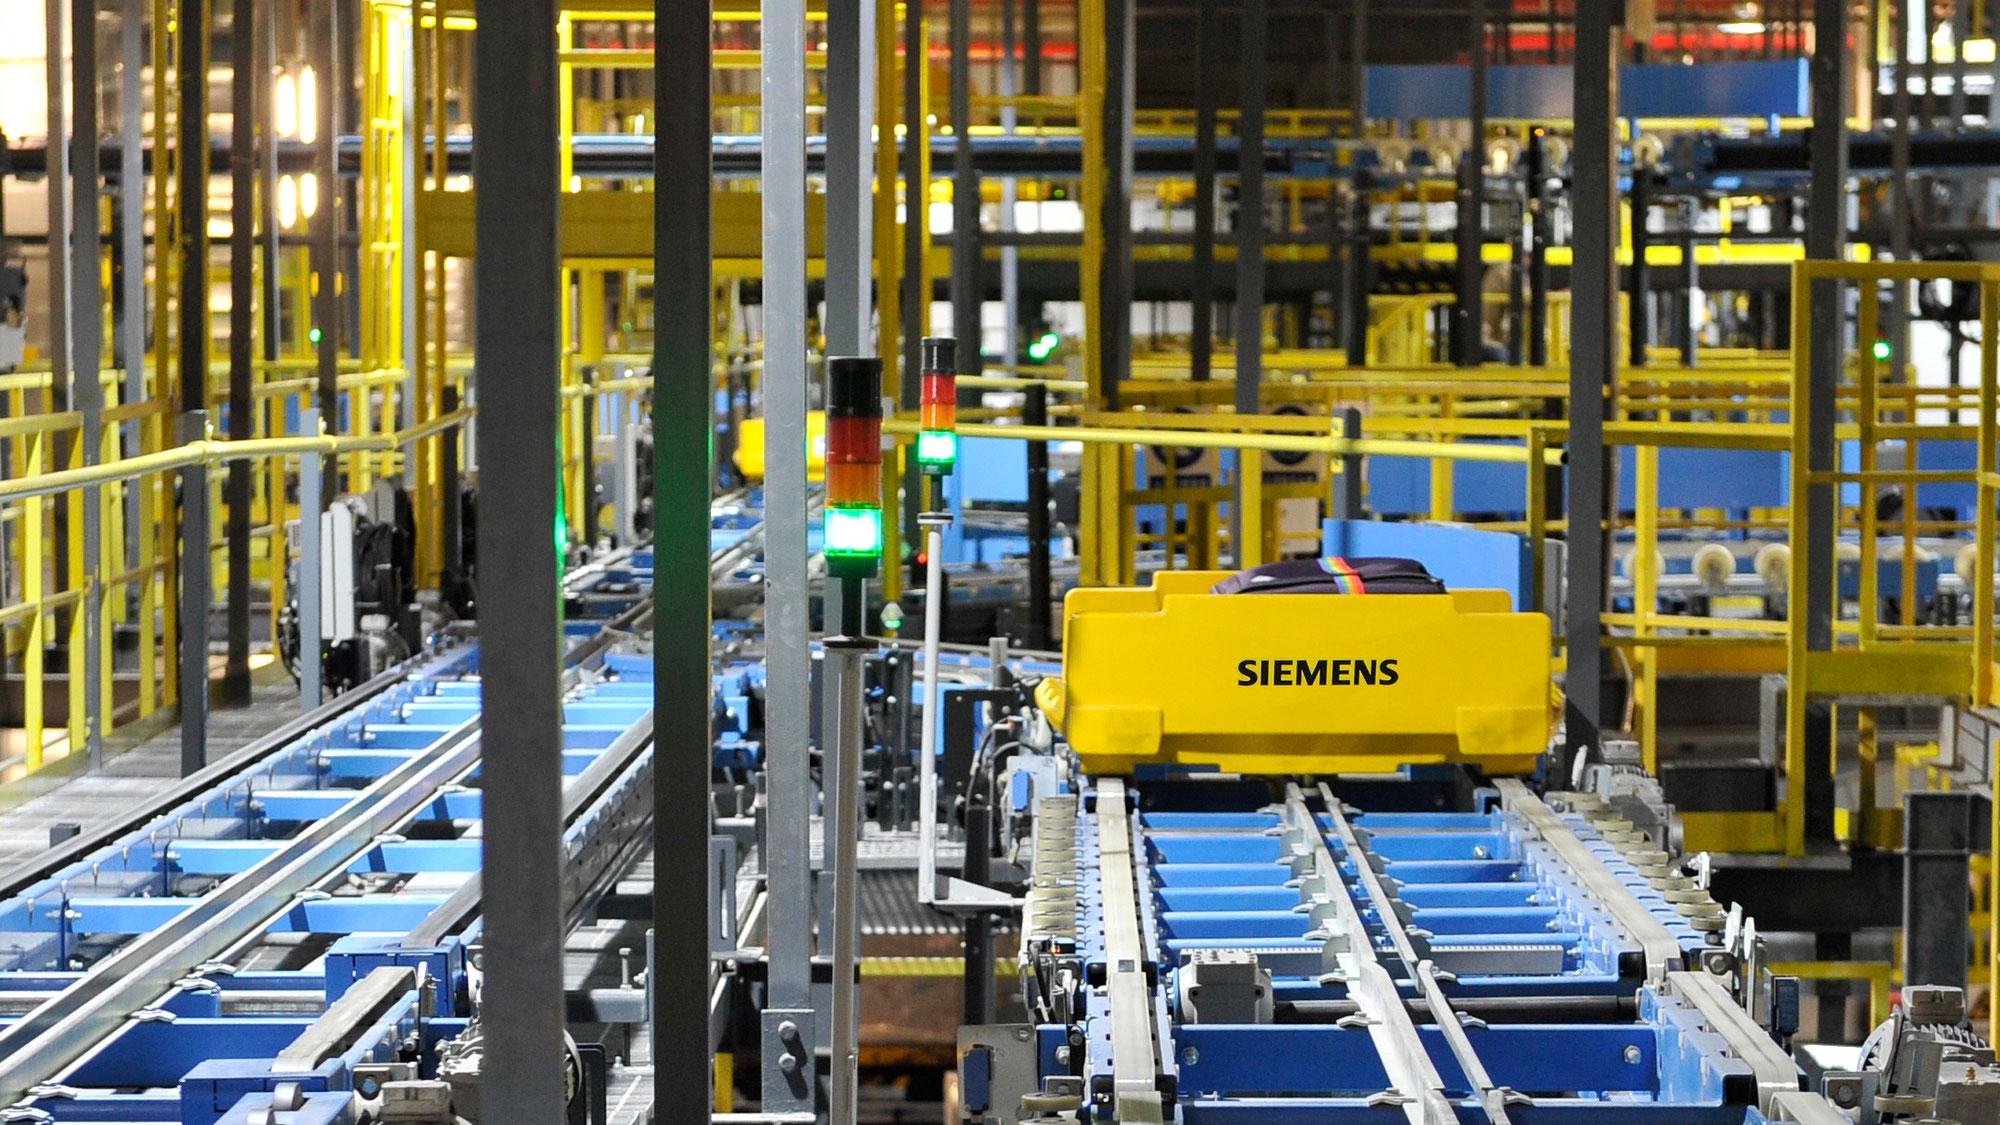 Visit to the Siemens Logistics test centre